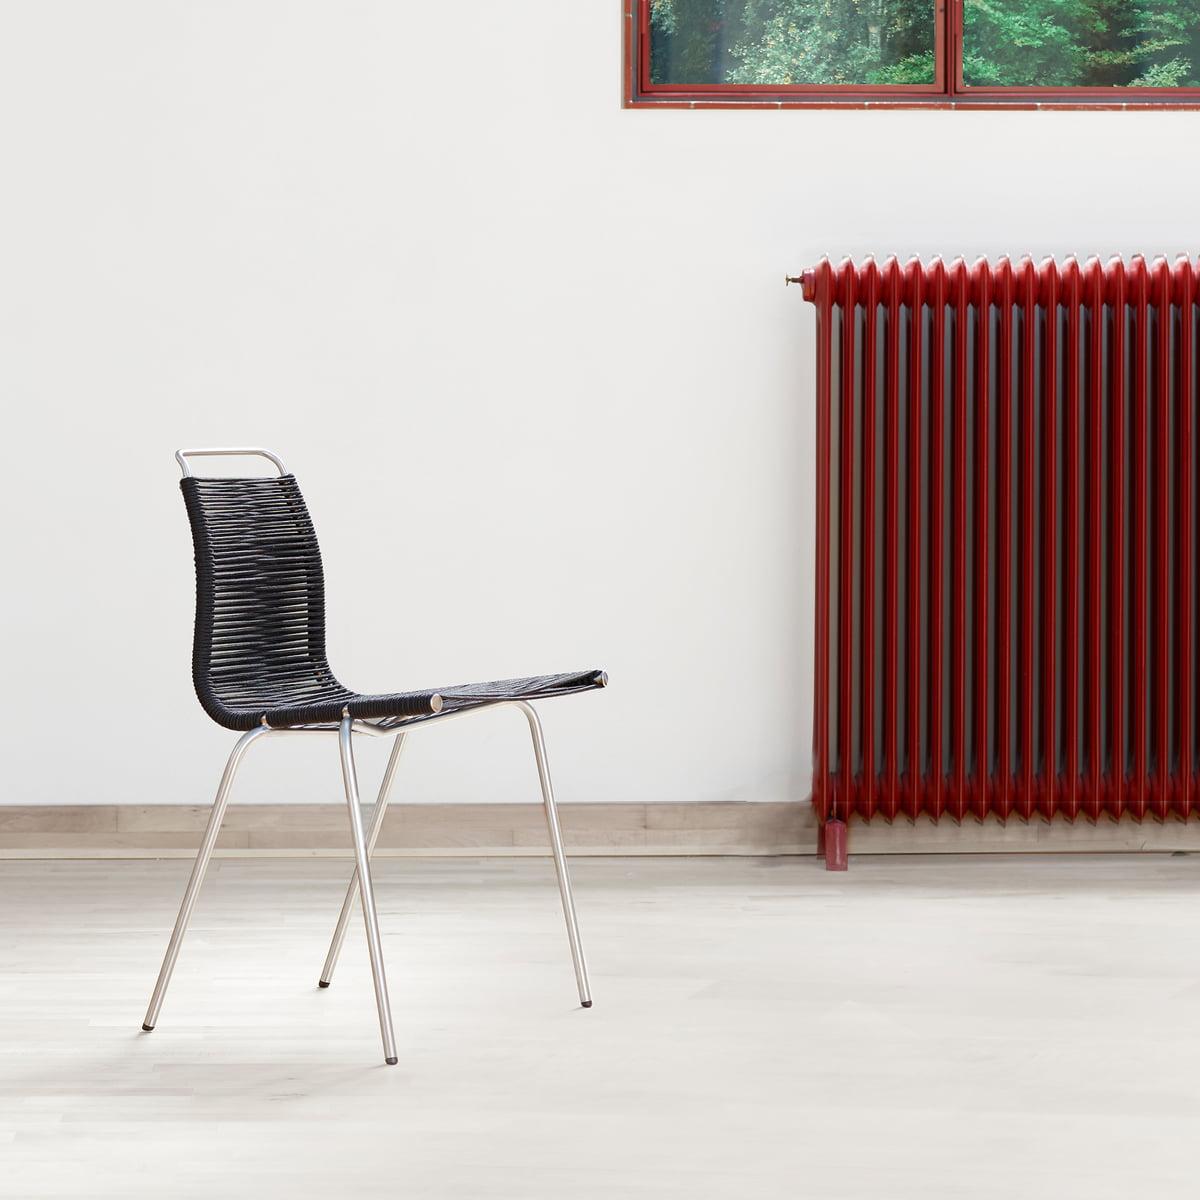 pk1 chair by carl hansen connox. Black Bedroom Furniture Sets. Home Design Ideas